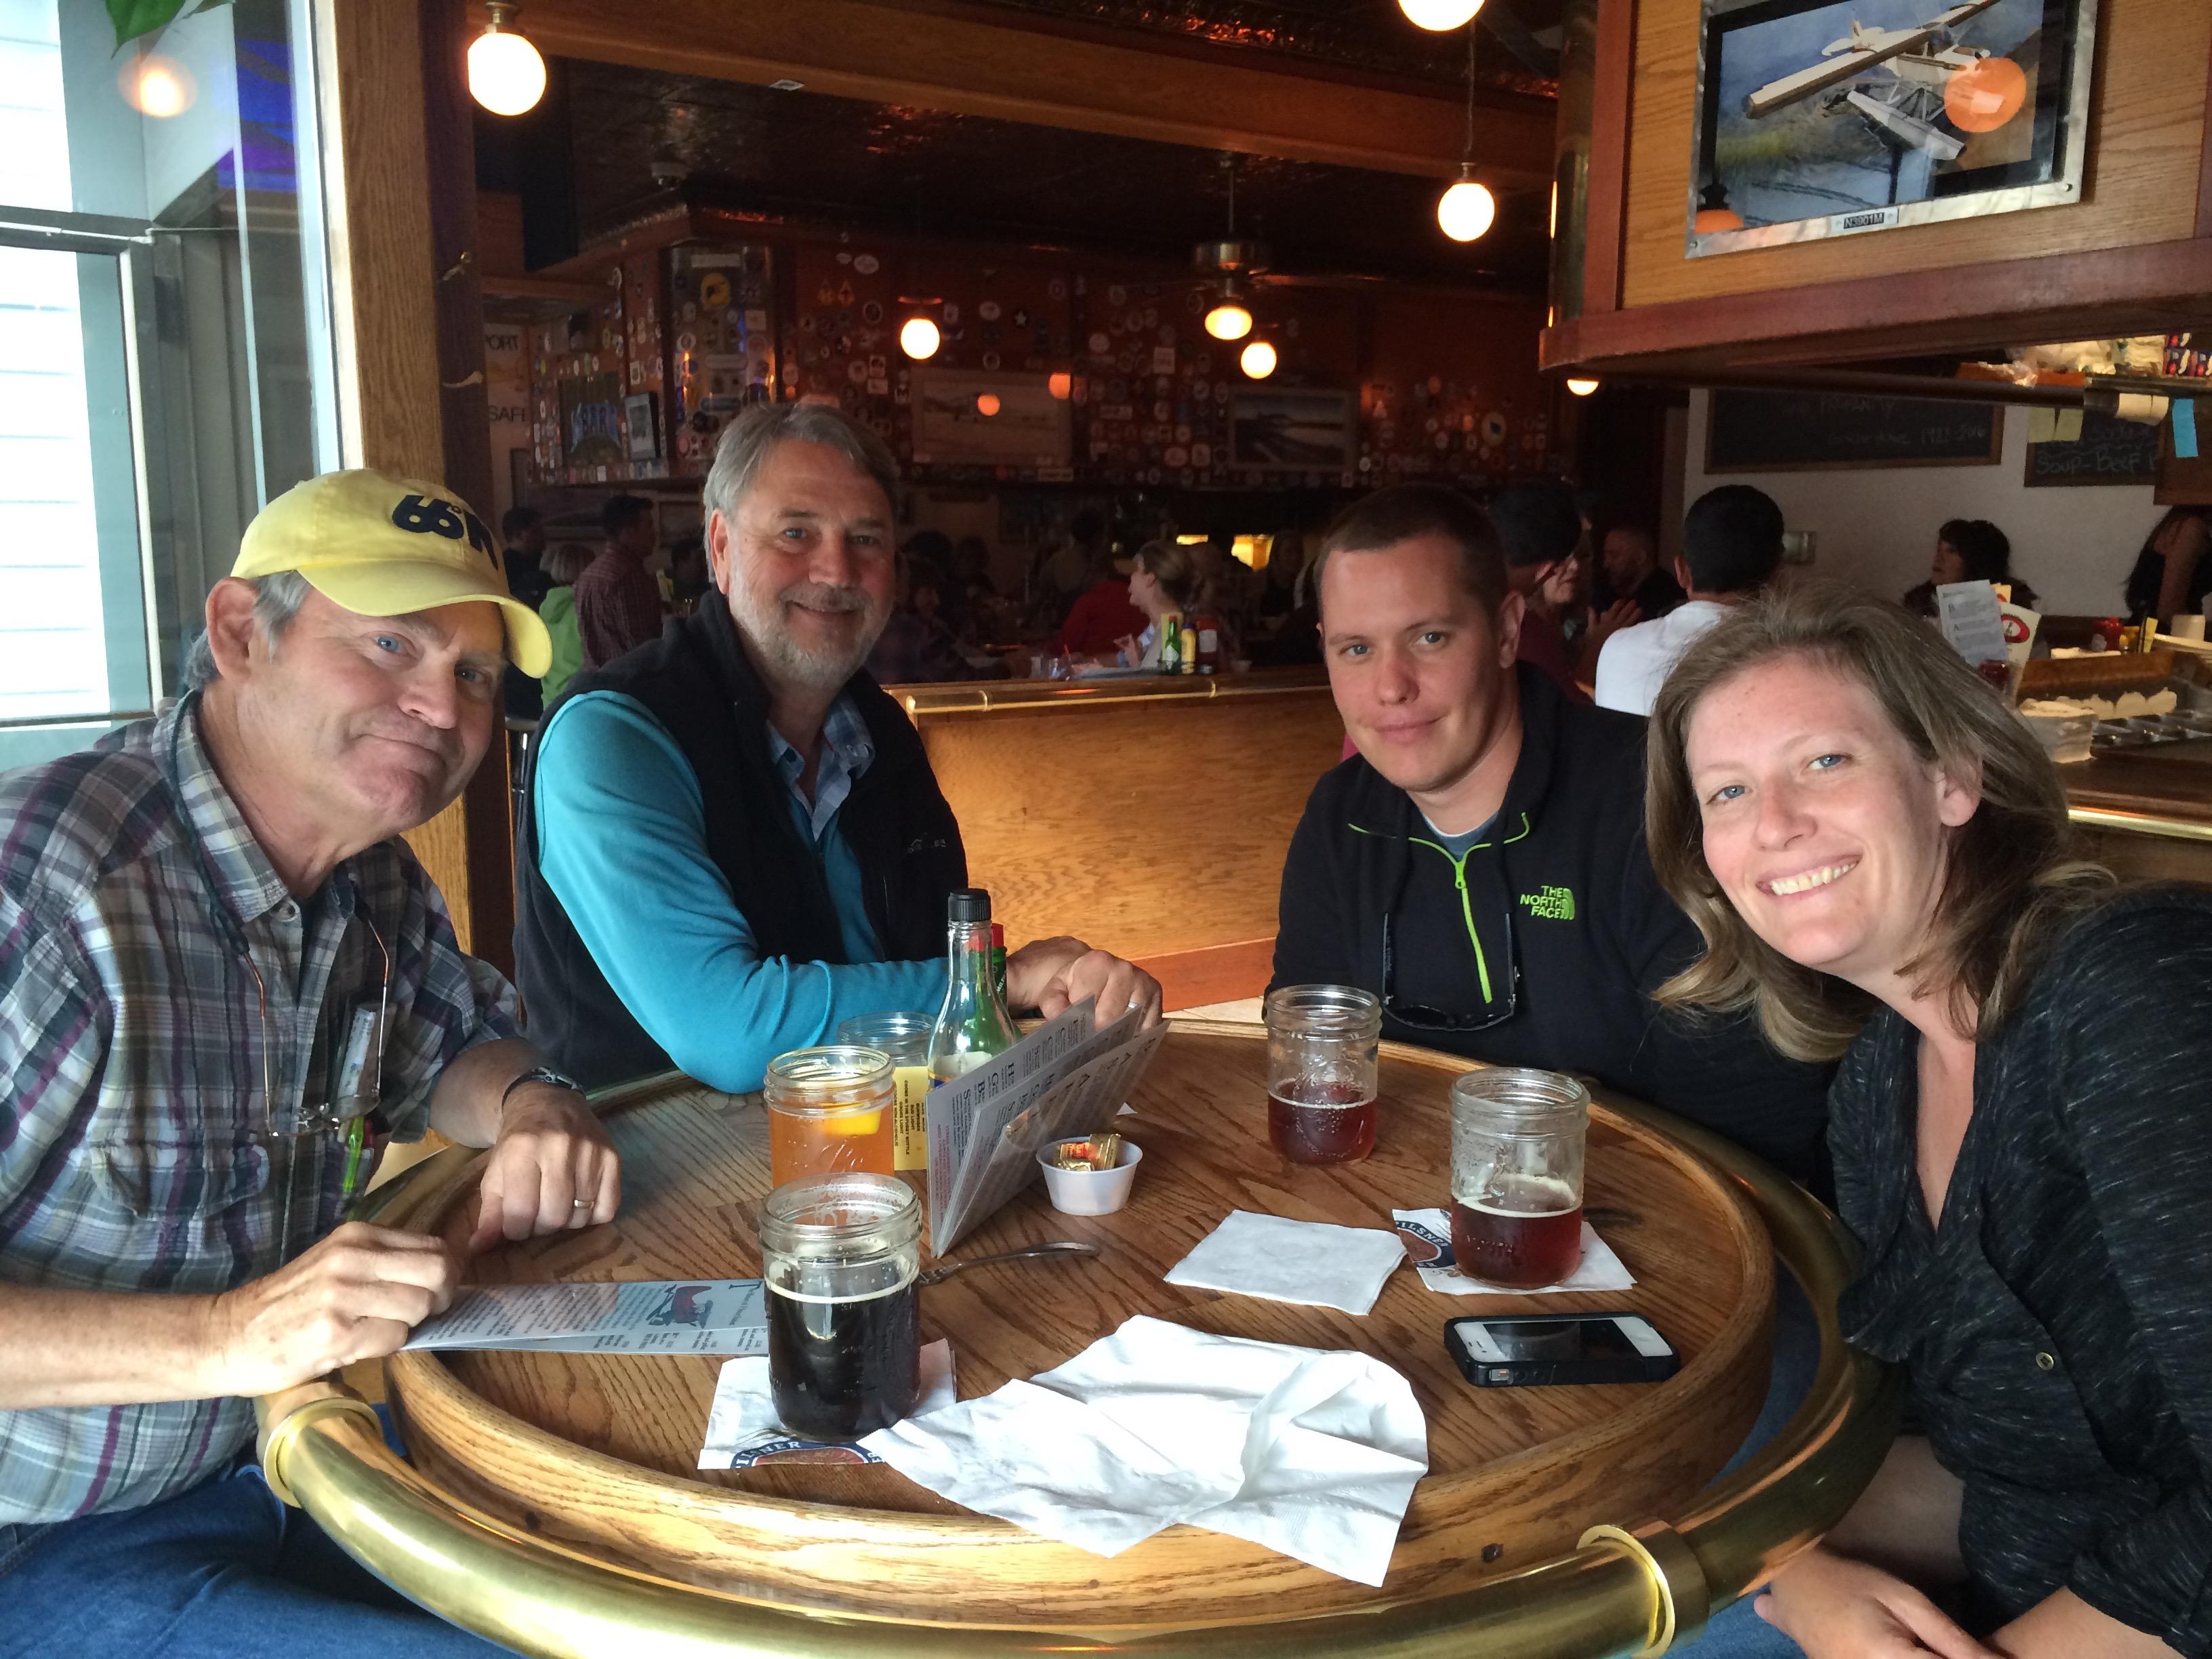 Craig Goodknight, Paul Darr, Stephen Pitton, Danika Marshall in F Street Grill in Anchorage